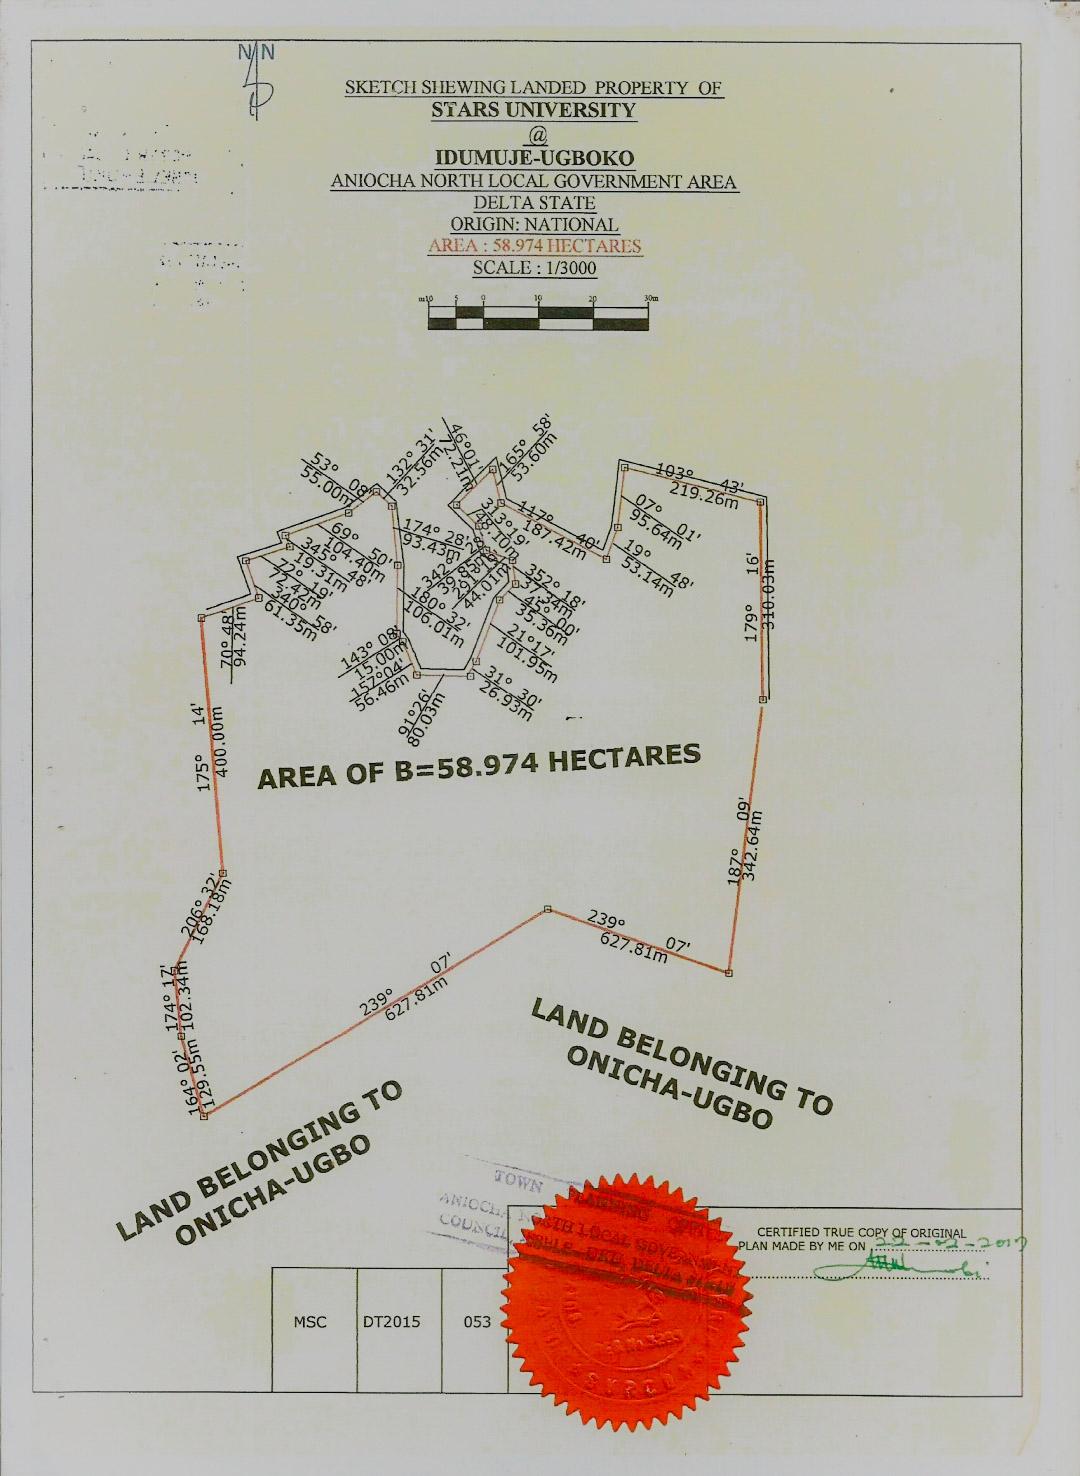 A Screenshot of the Certificate of Occupancy